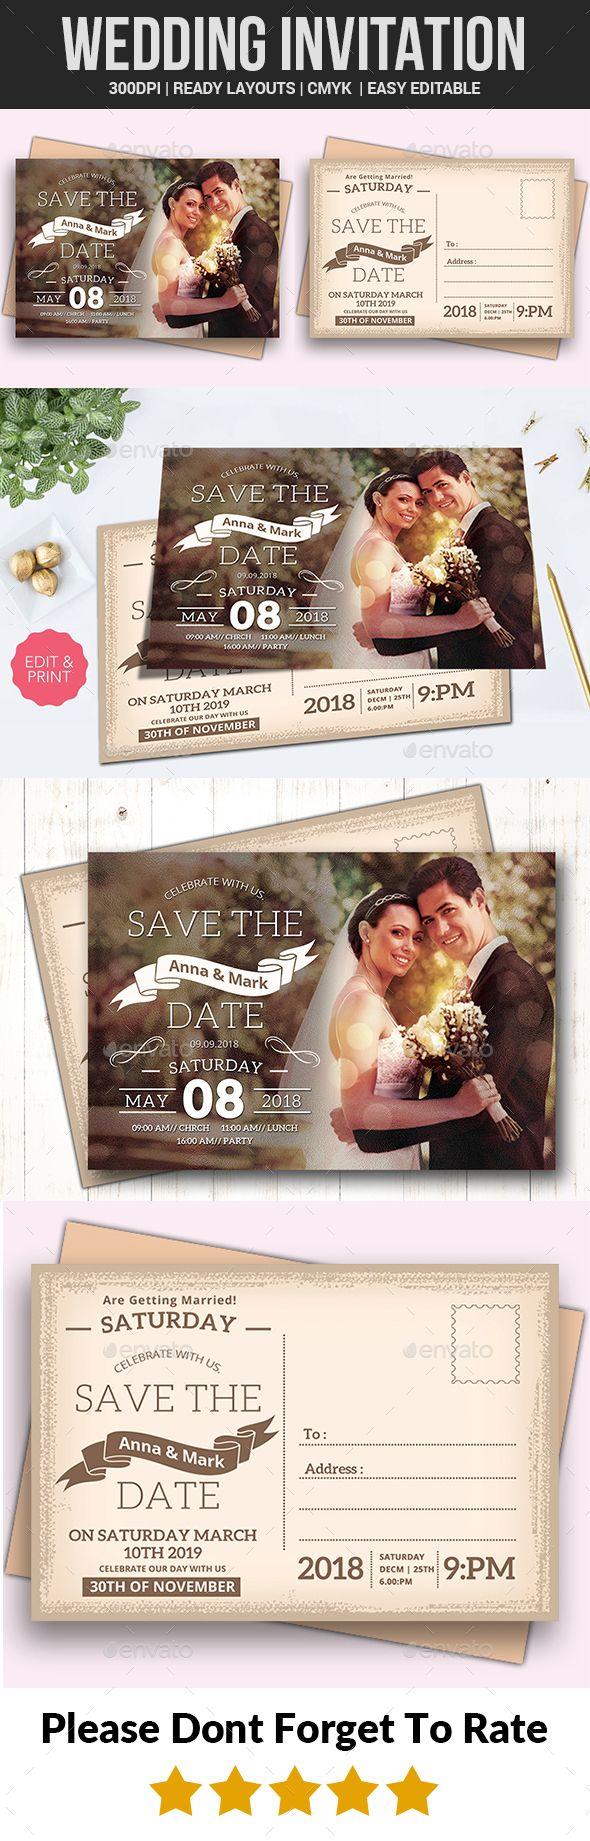 Wedding Invitation Template PSD Download httpsgraphicrivernetitem